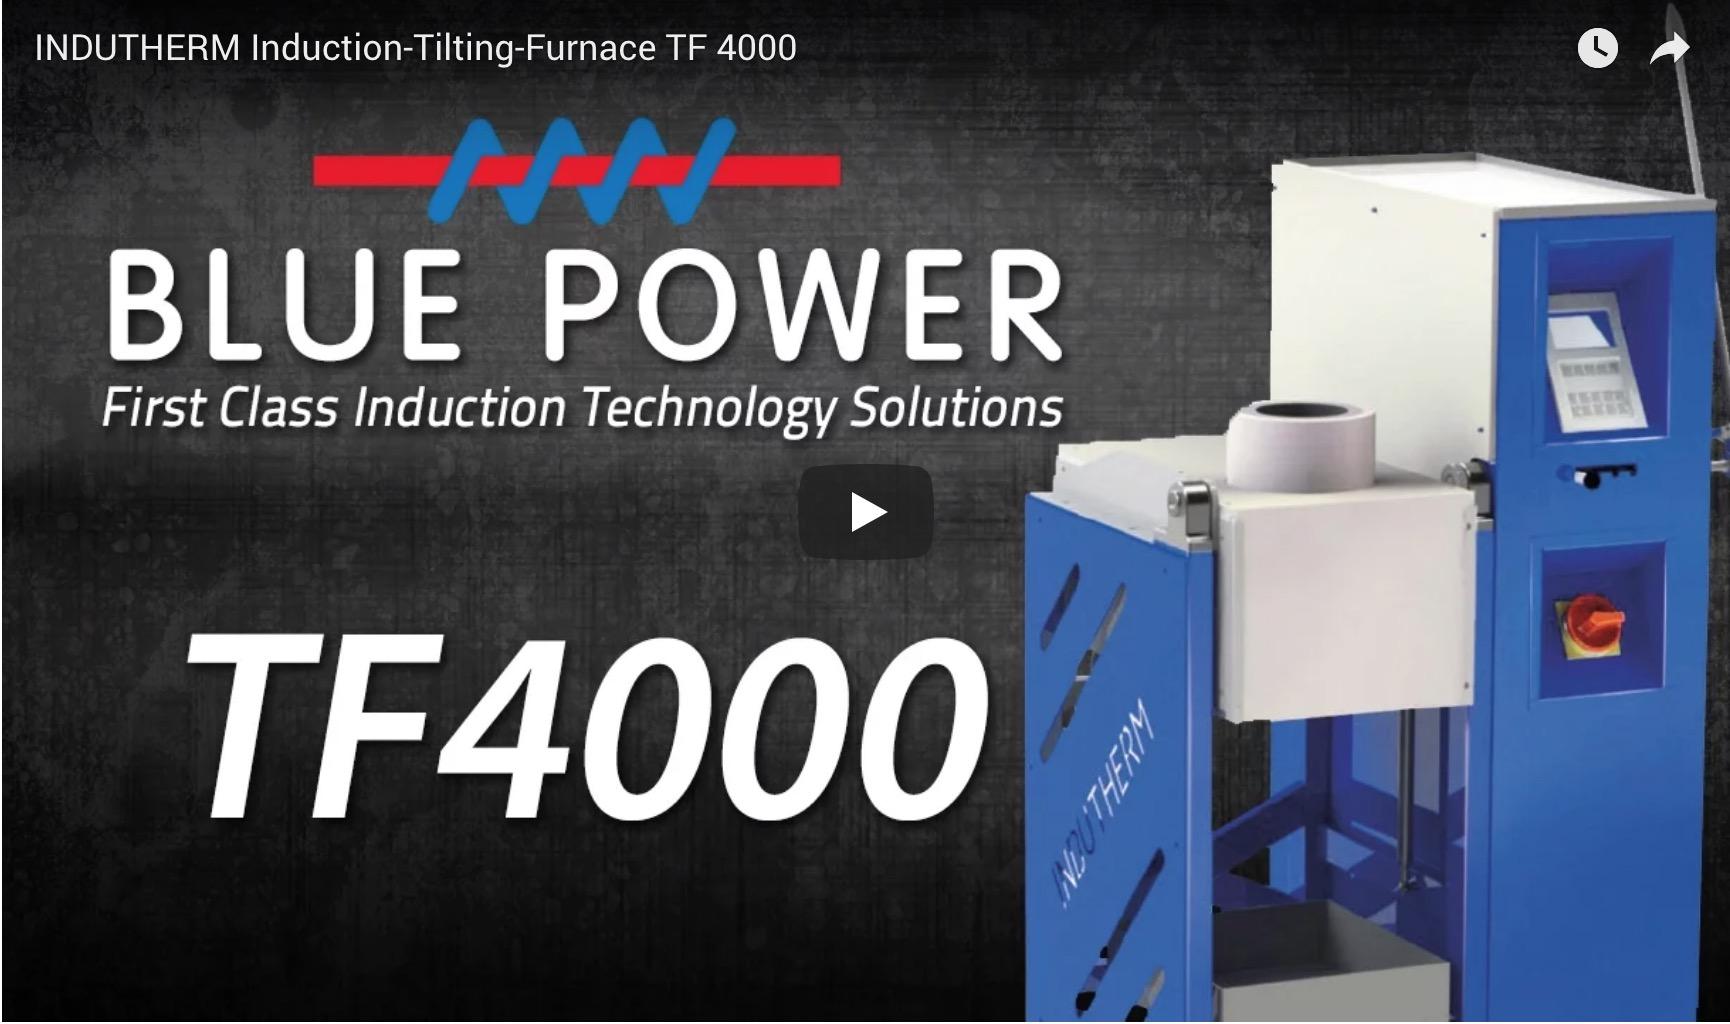 Indutherm Induction Tilting Furnace TF4000